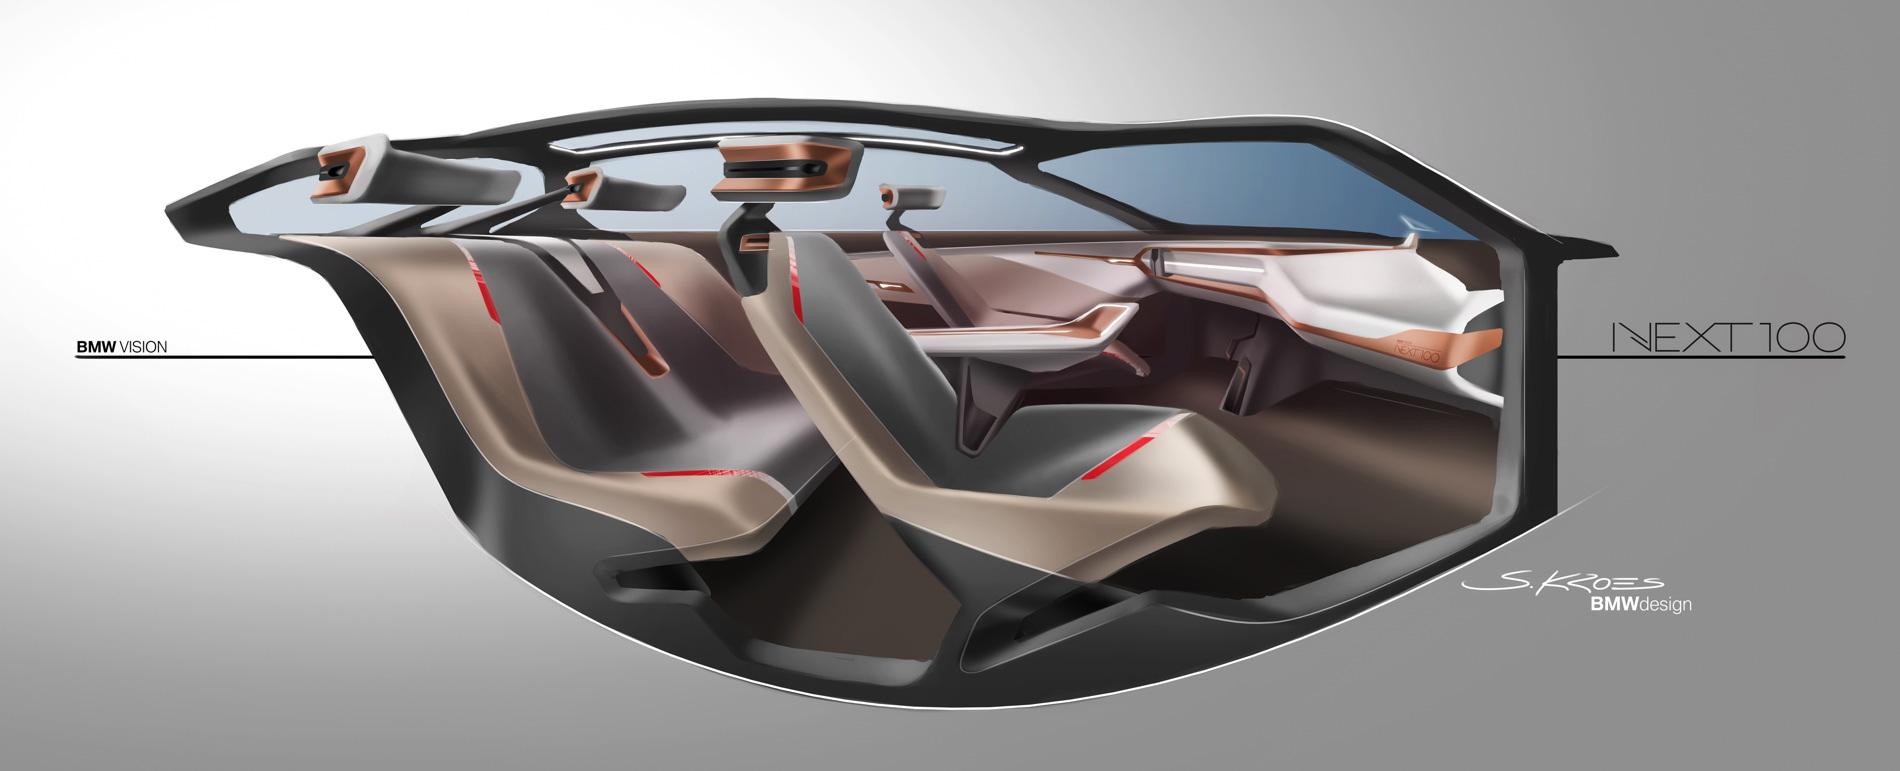 BMW VISION NEXT 100 74